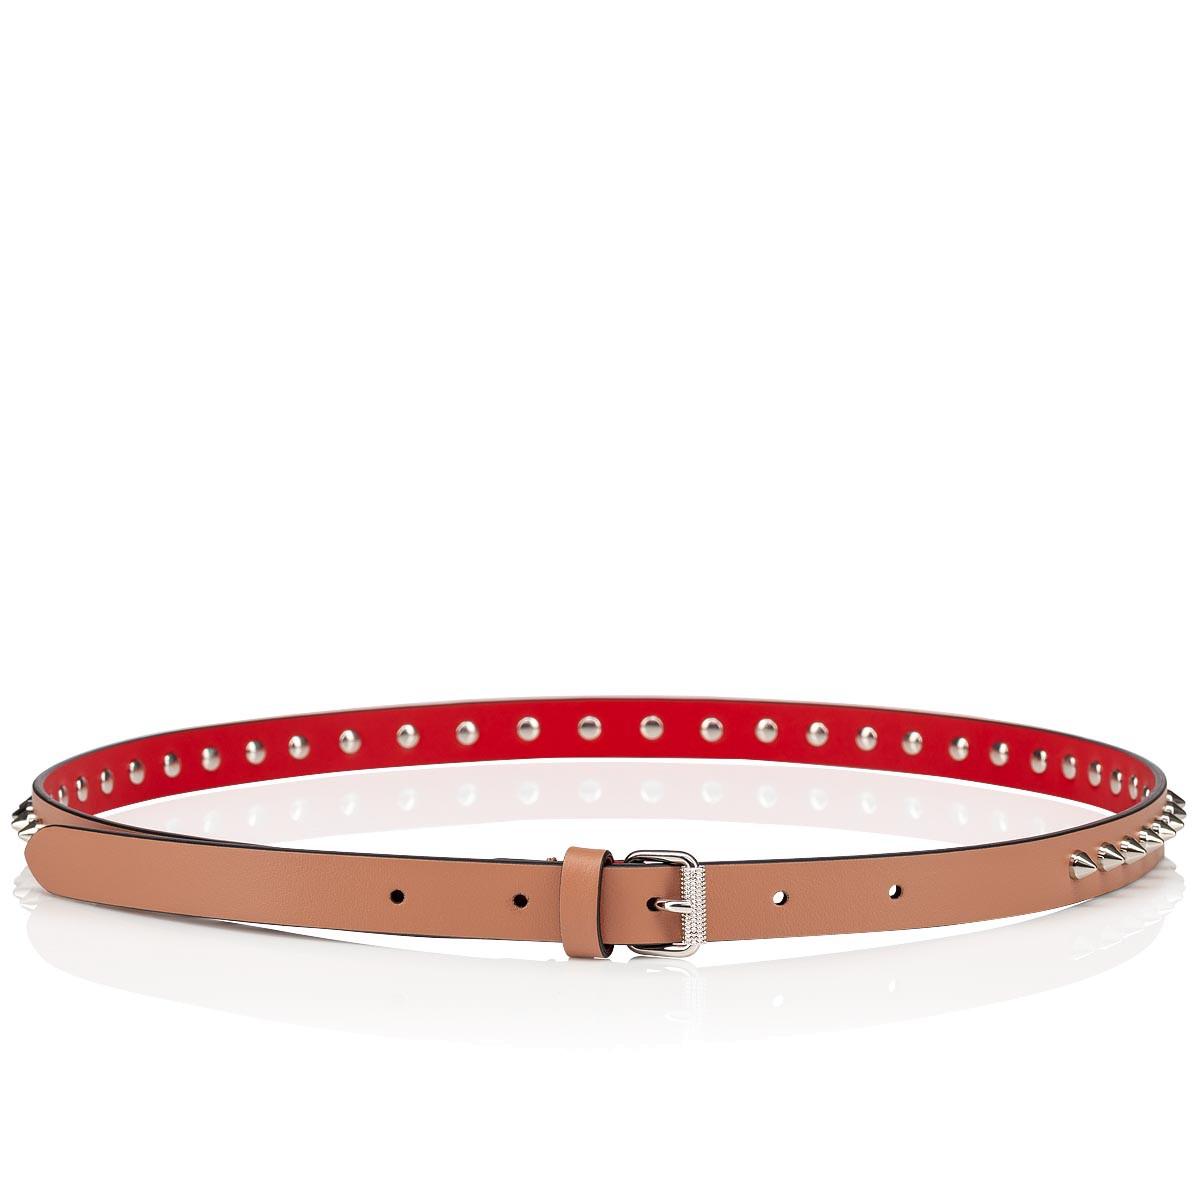 Belt - Loubispikes Belt - Christian Louboutin